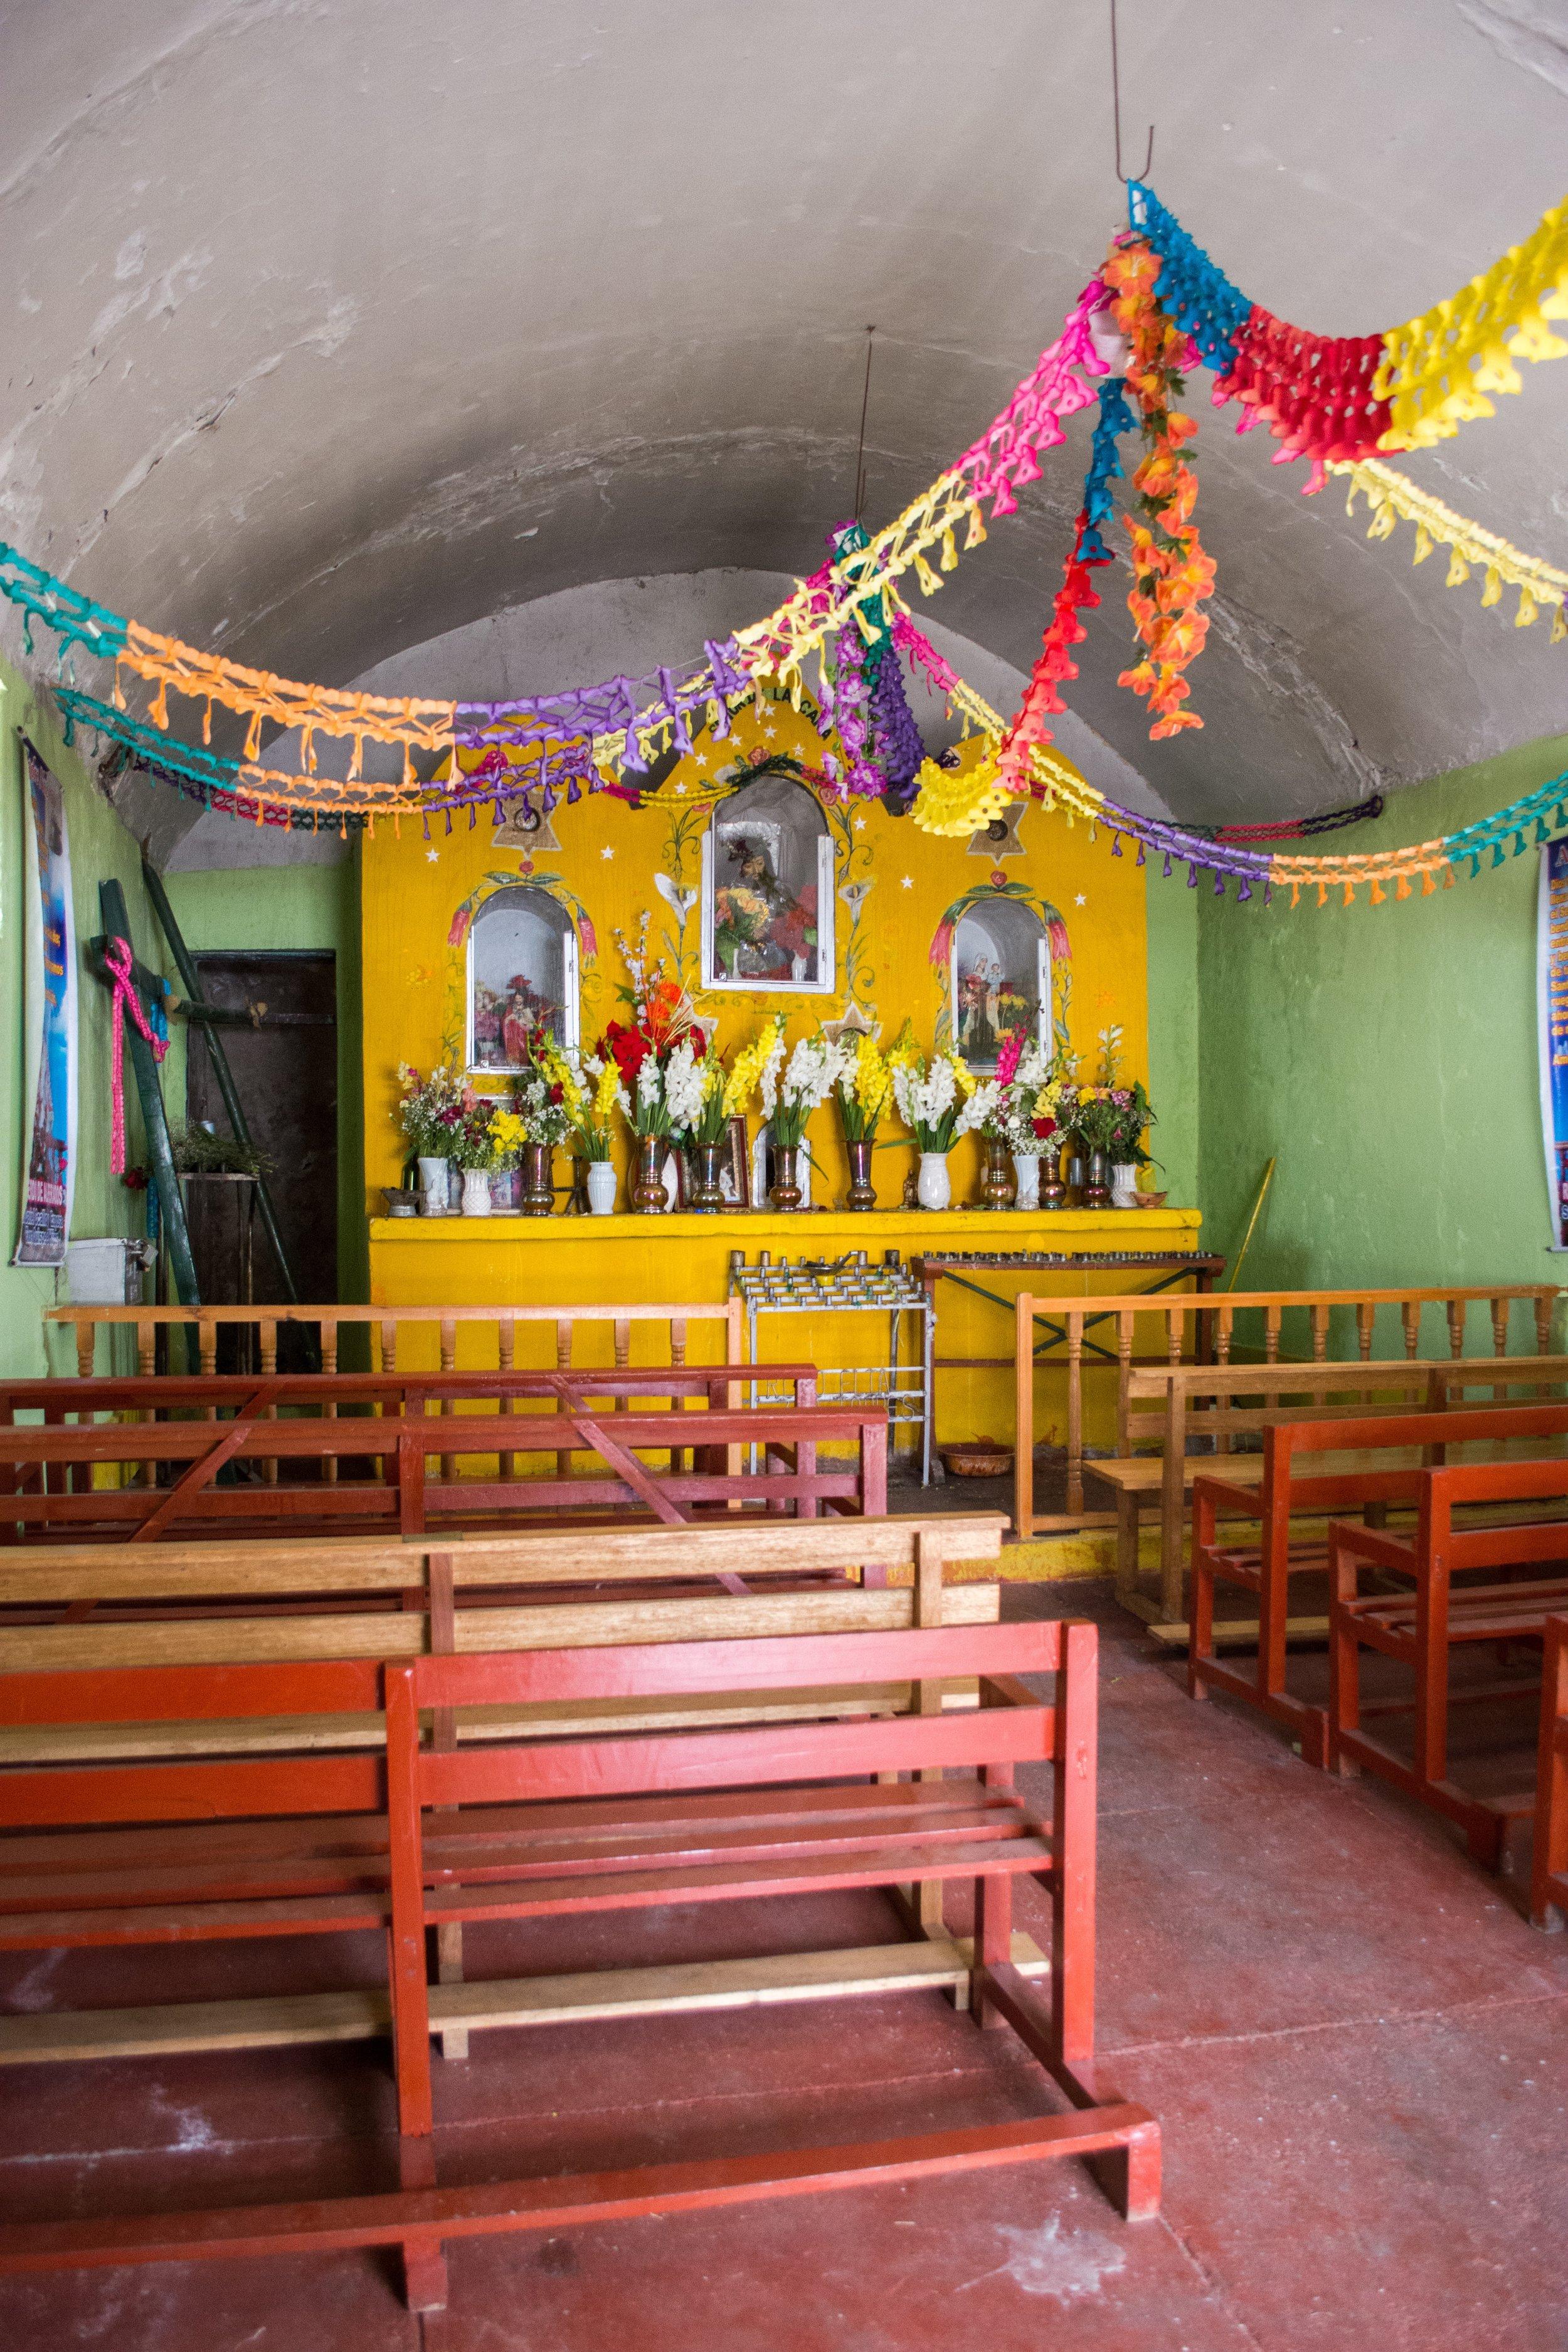 Small Church next to the textile market at Abra La Raya